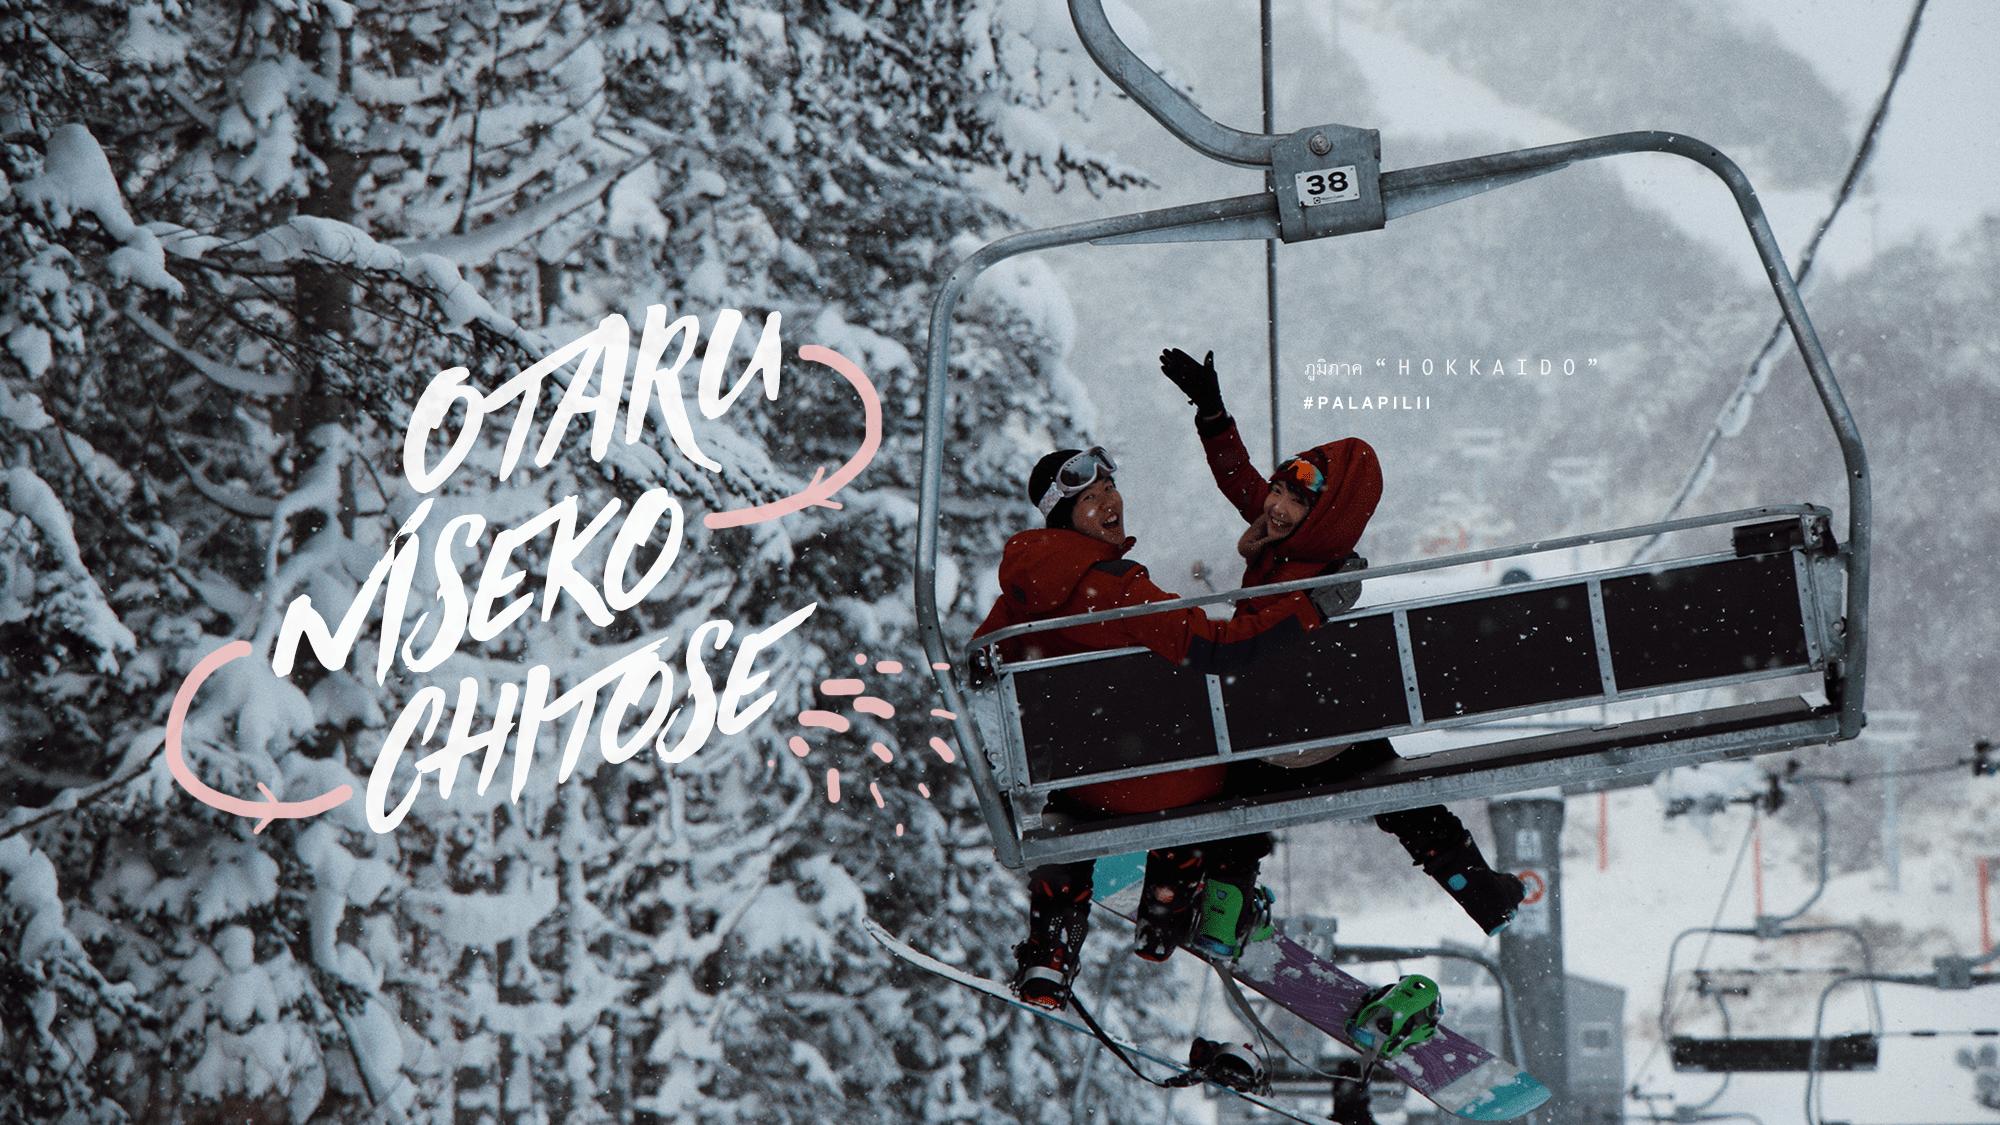 ROAD TRIP HOKKAIDO: โอตารุ – นิเซโกะ – ชิโตเซะ 6 วัน 5 คืน ด้วยเงิน 35,000 บาท [ รวมตั๋วเครื่องบิน + เน้นเล่น Snowboard ]